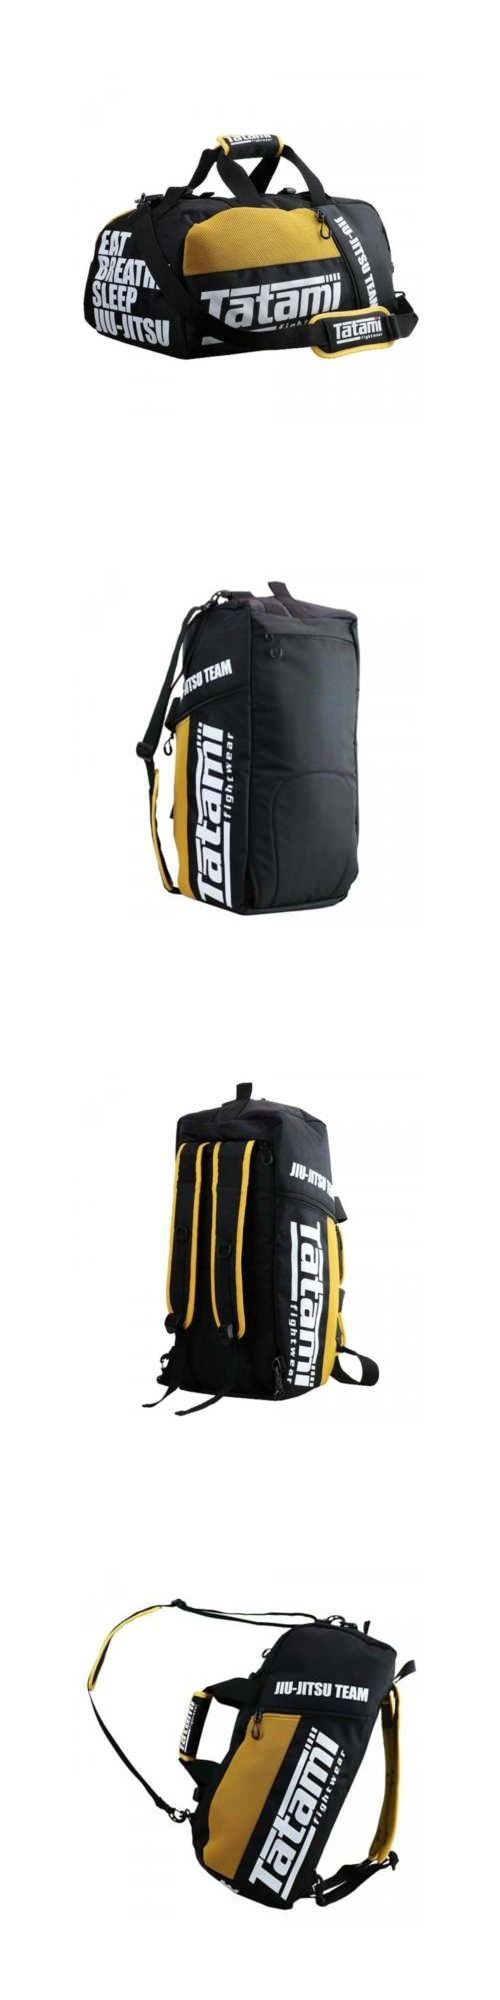 Other Combat Sport Supplies 16044: Tatami Mma Jiu Jitsu Gear Gym Bag - Yellow -> BUY IT NOW ONLY: $69 on eBay!